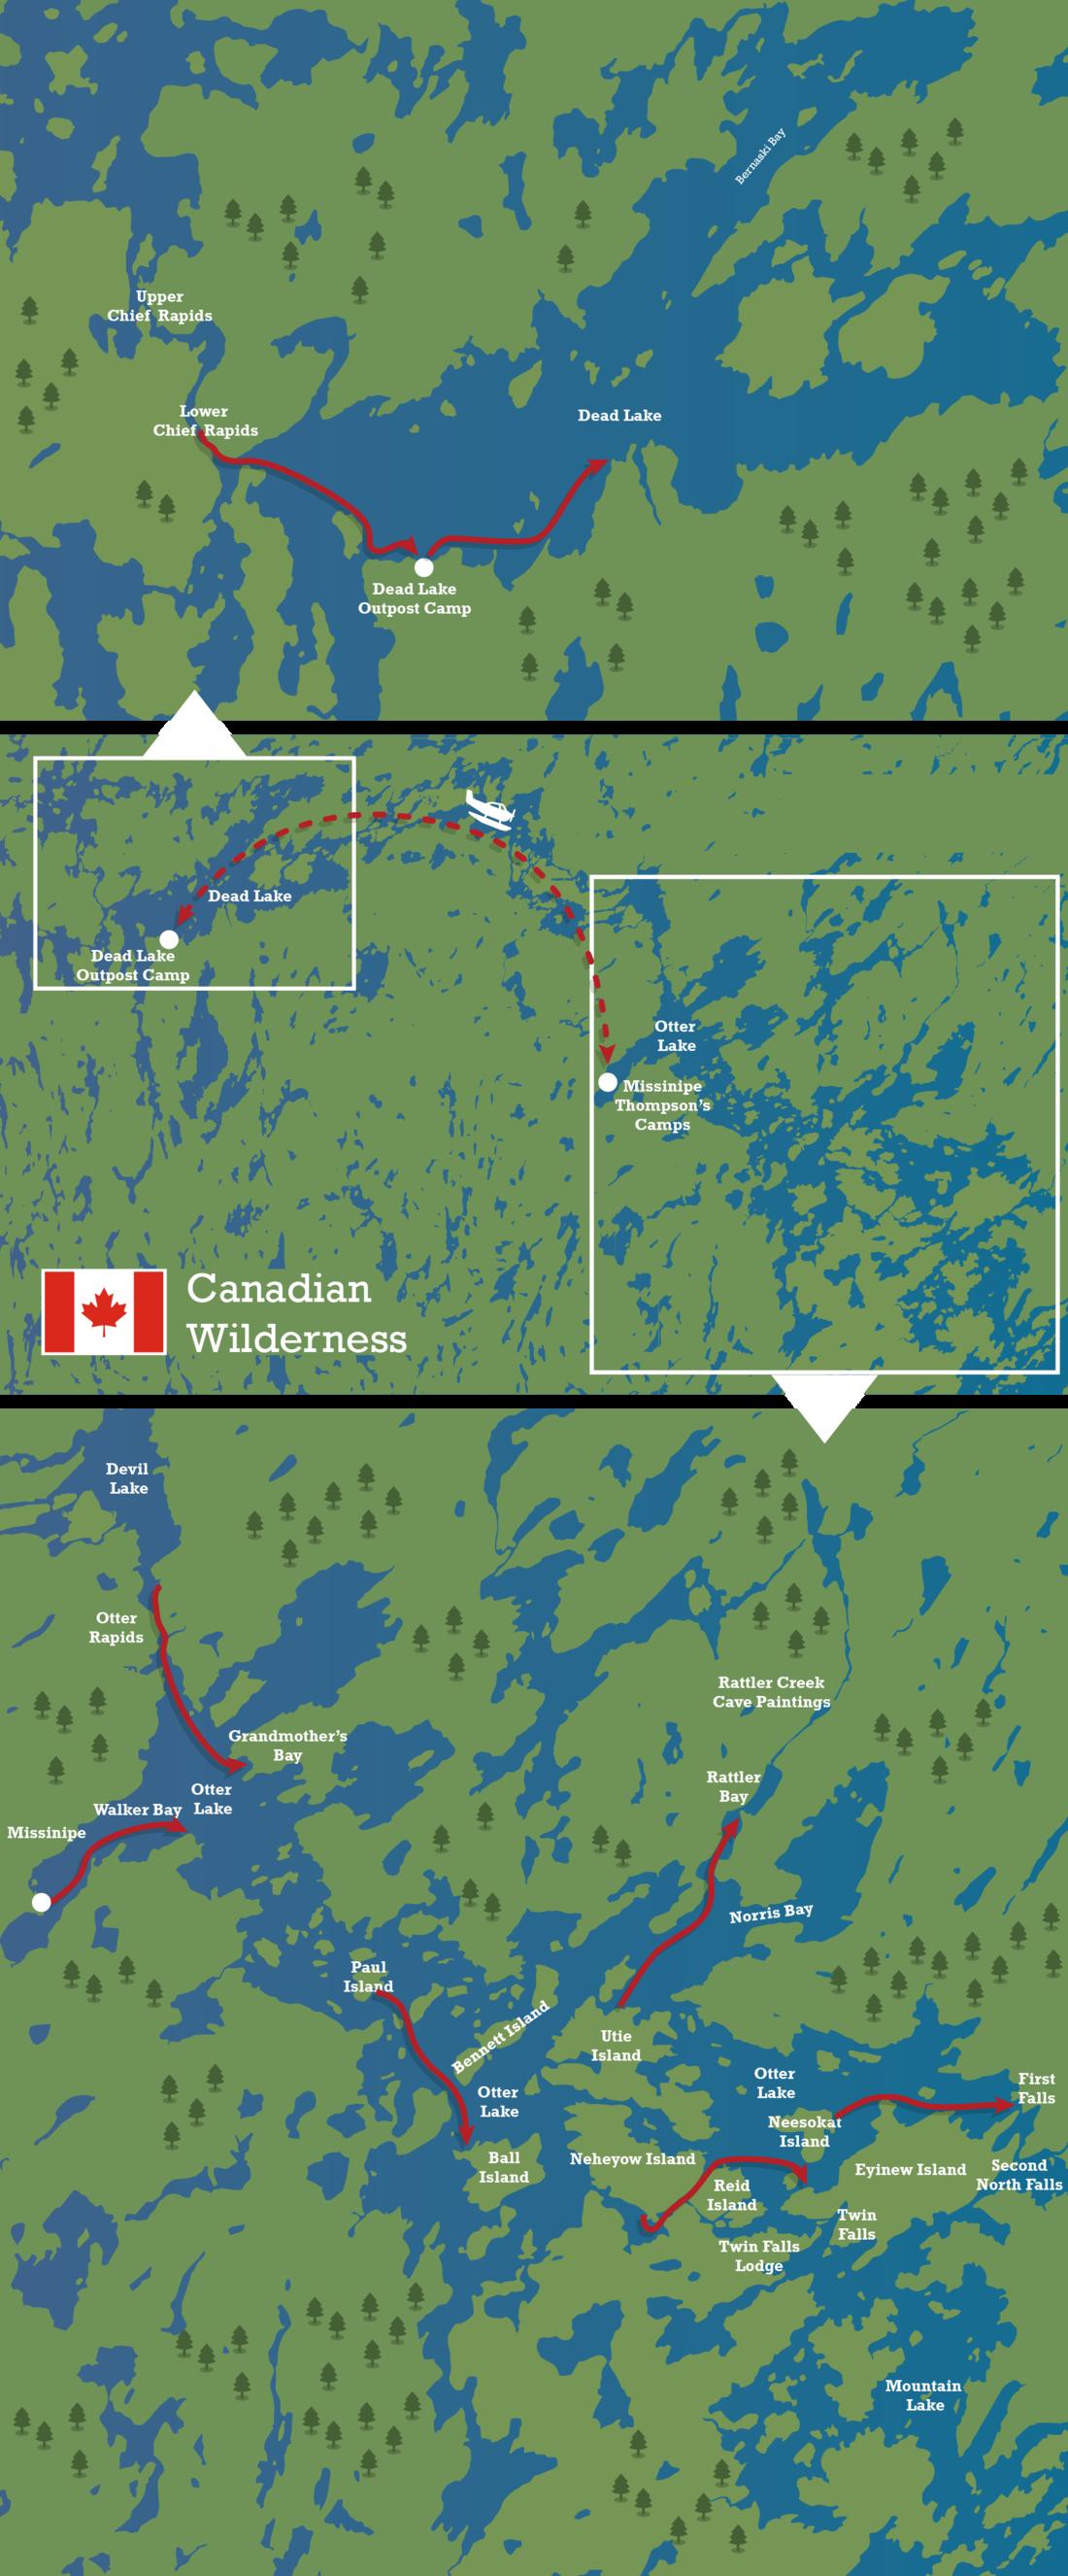 Canadian wilderness map v2 01